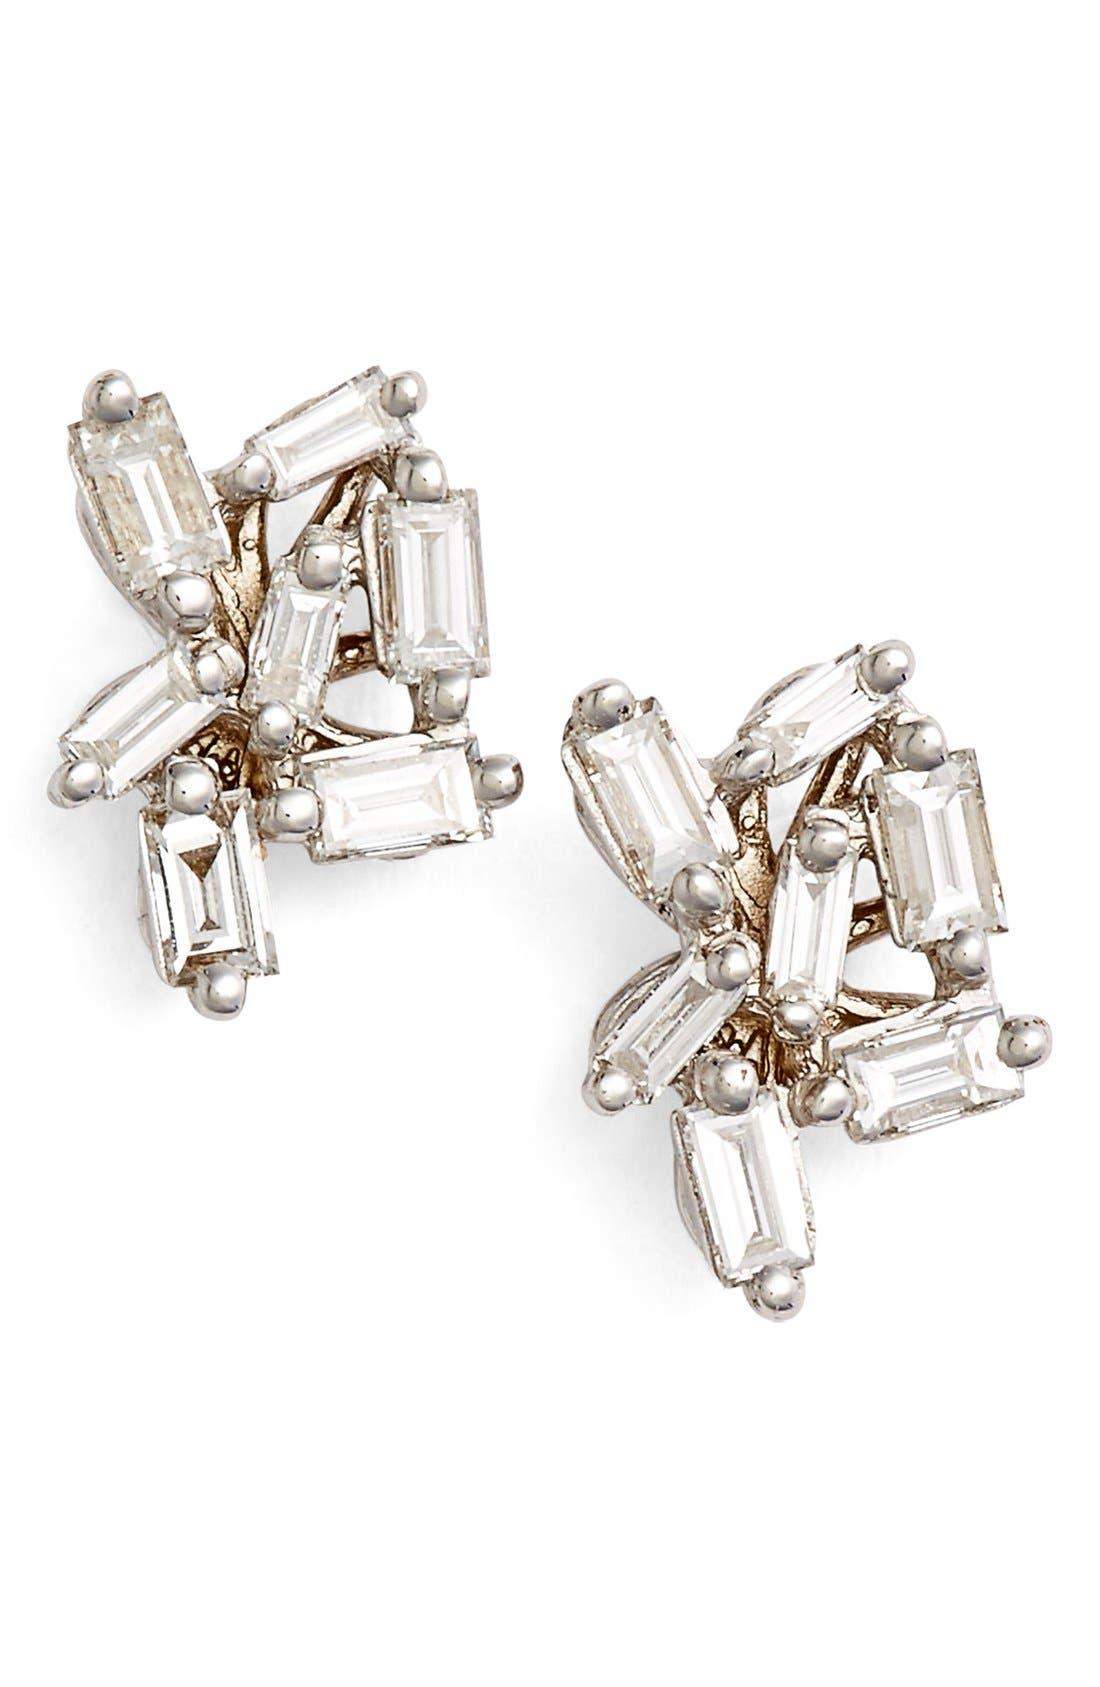 Suzanne Kalan 'Fireworks' Diamond Cluster Stud Earrings